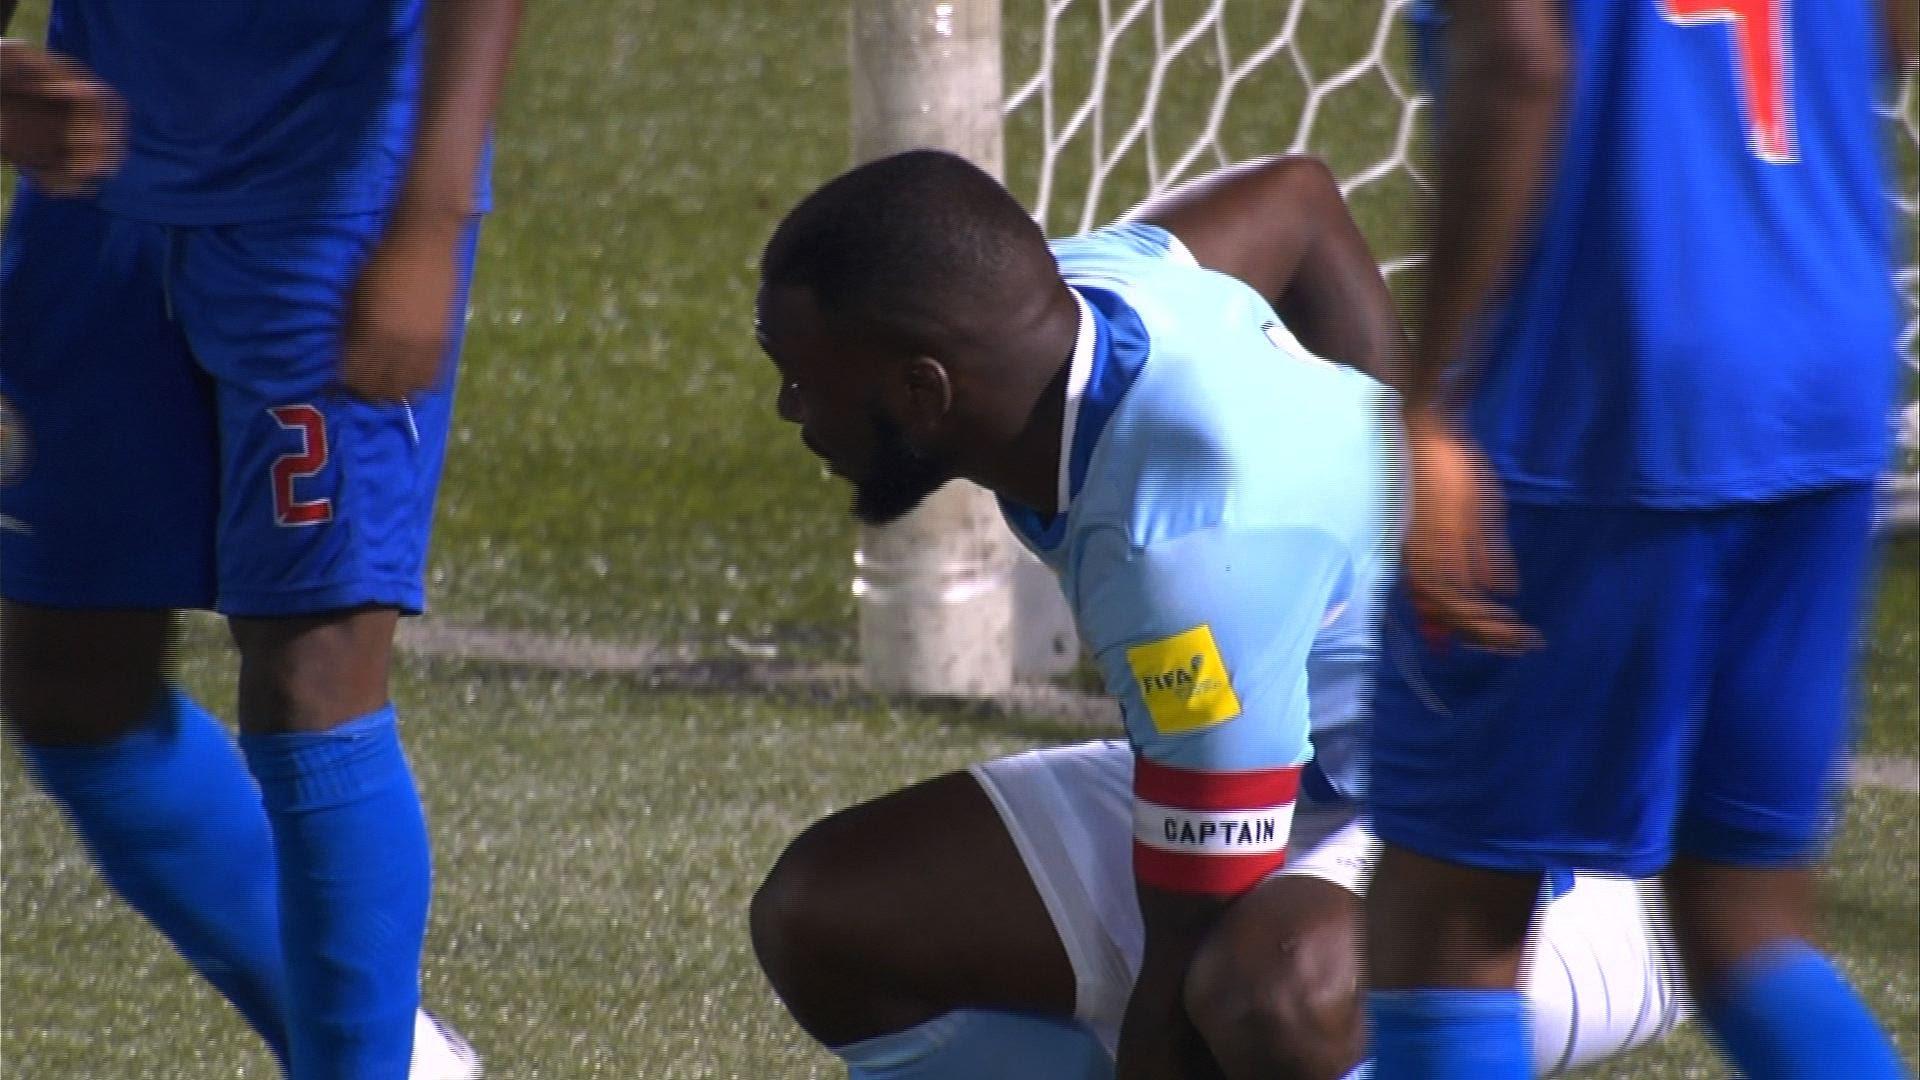 Haiti Goalkeeper Pulls Off 'Gordon Banks-esque' Wonder Save In World Cup Qualifier